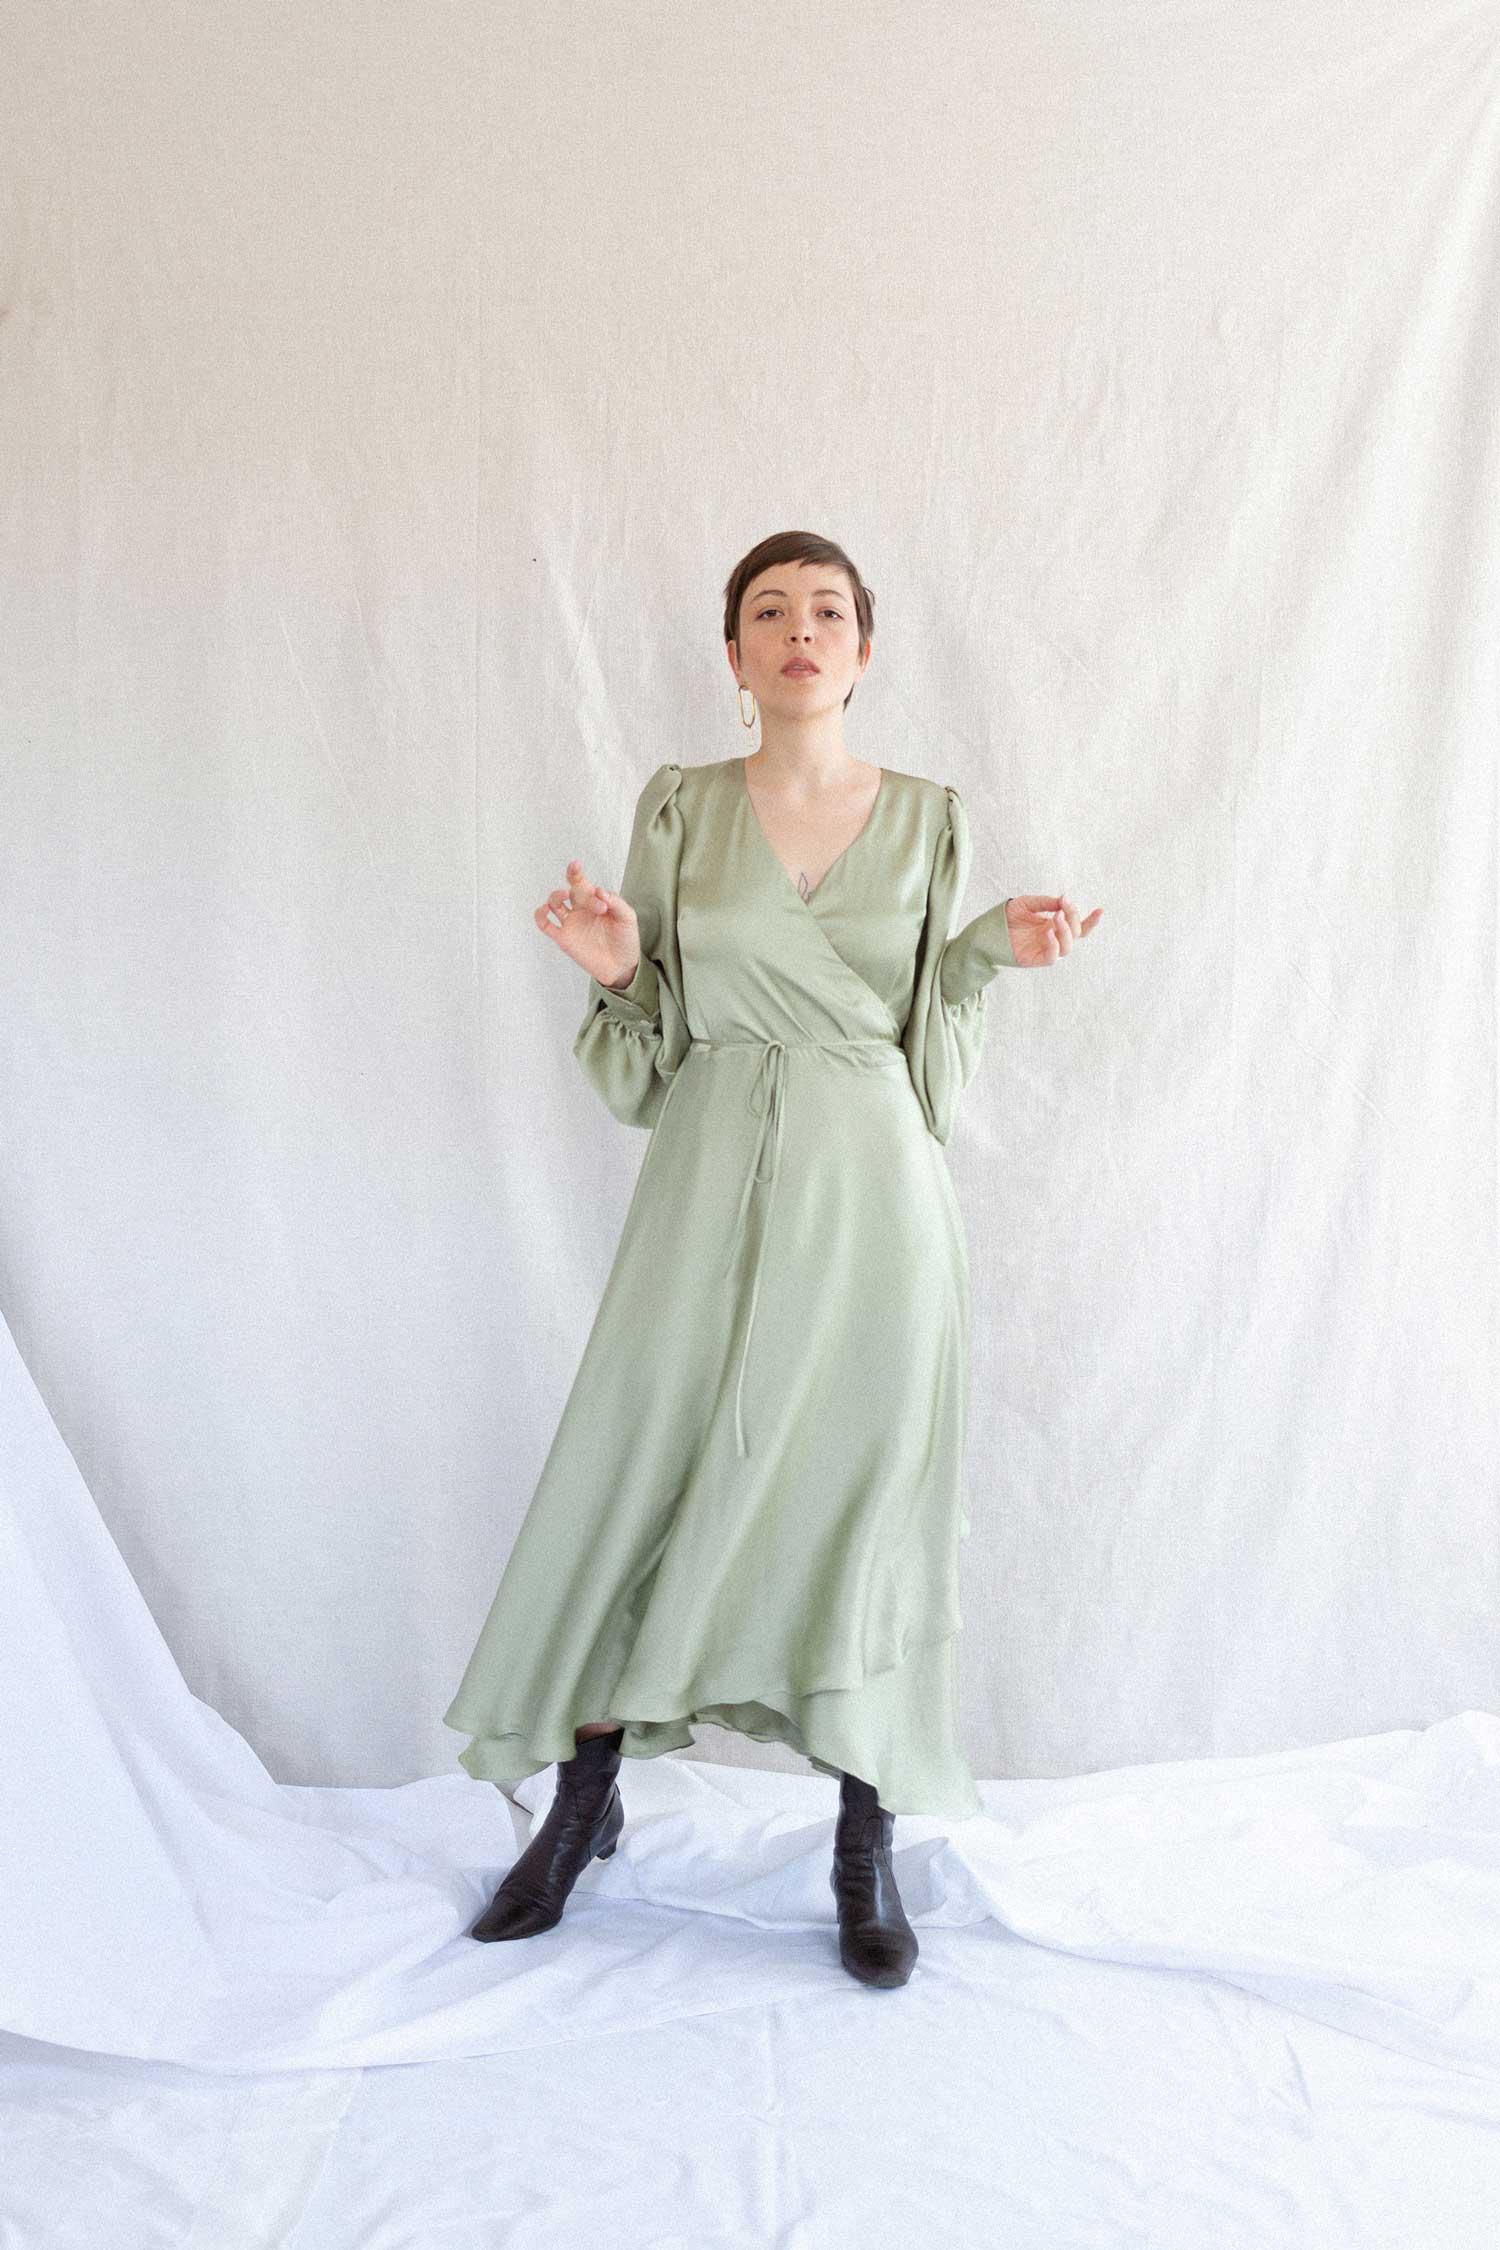 Renting Fashion – Kleidung online mieten: unown, Kleiderei, Stay awhile, Fairnica